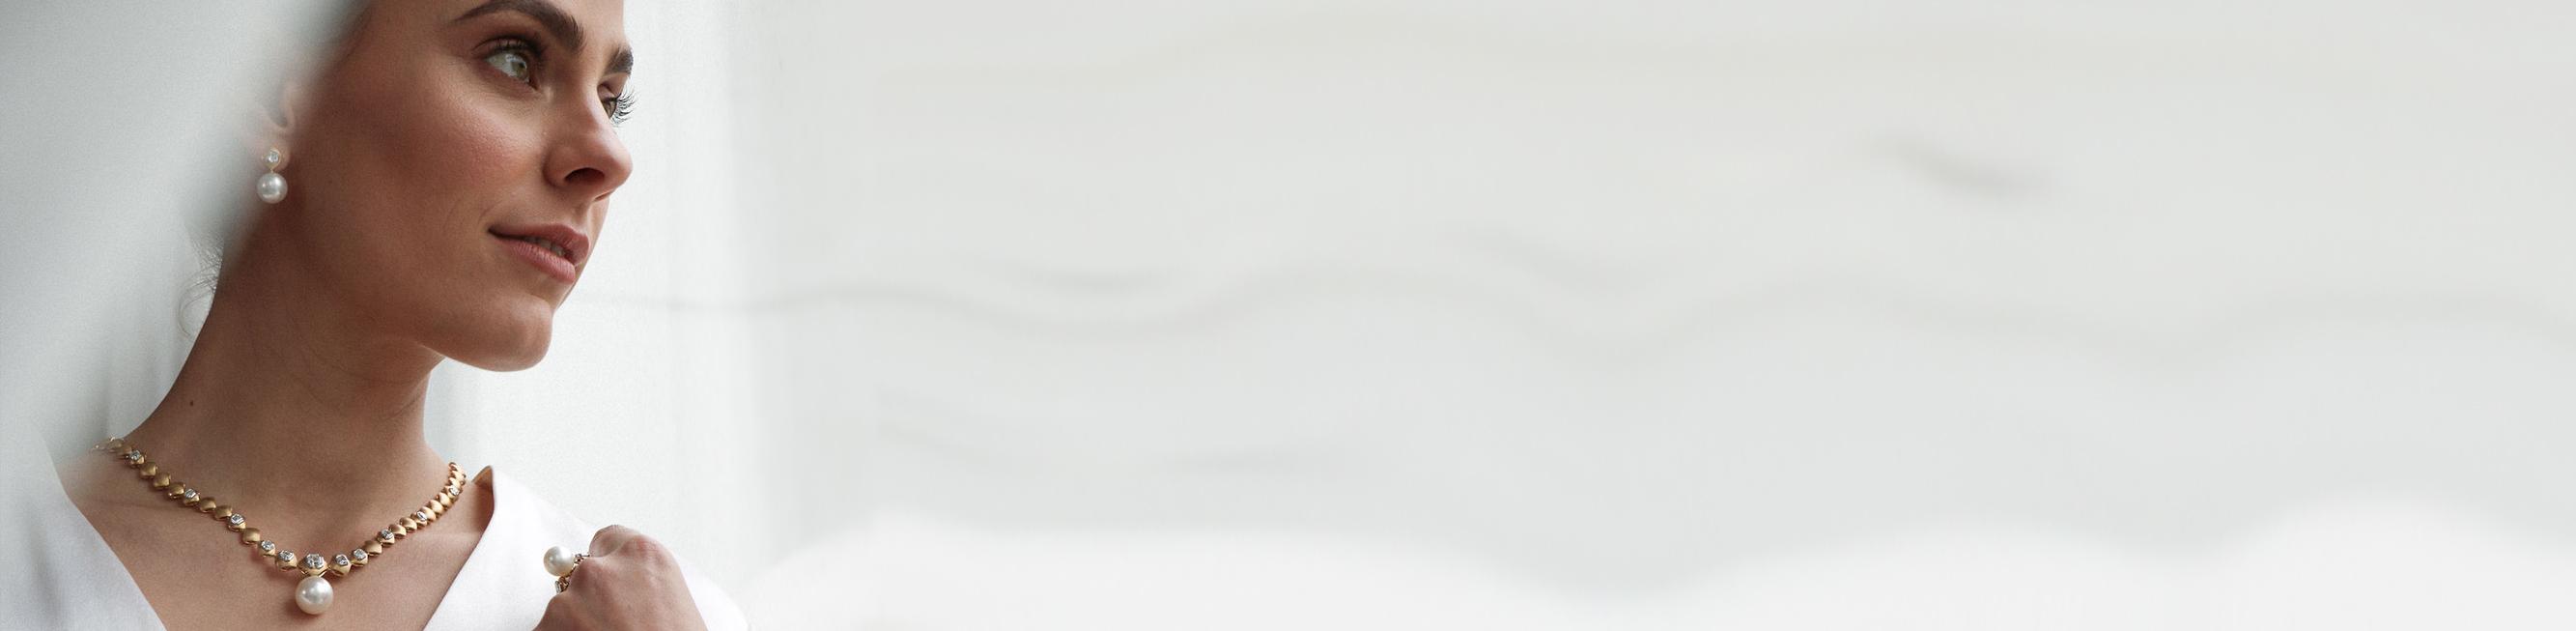 Kailis Bridal Jewellery - October 2020 News article hero image